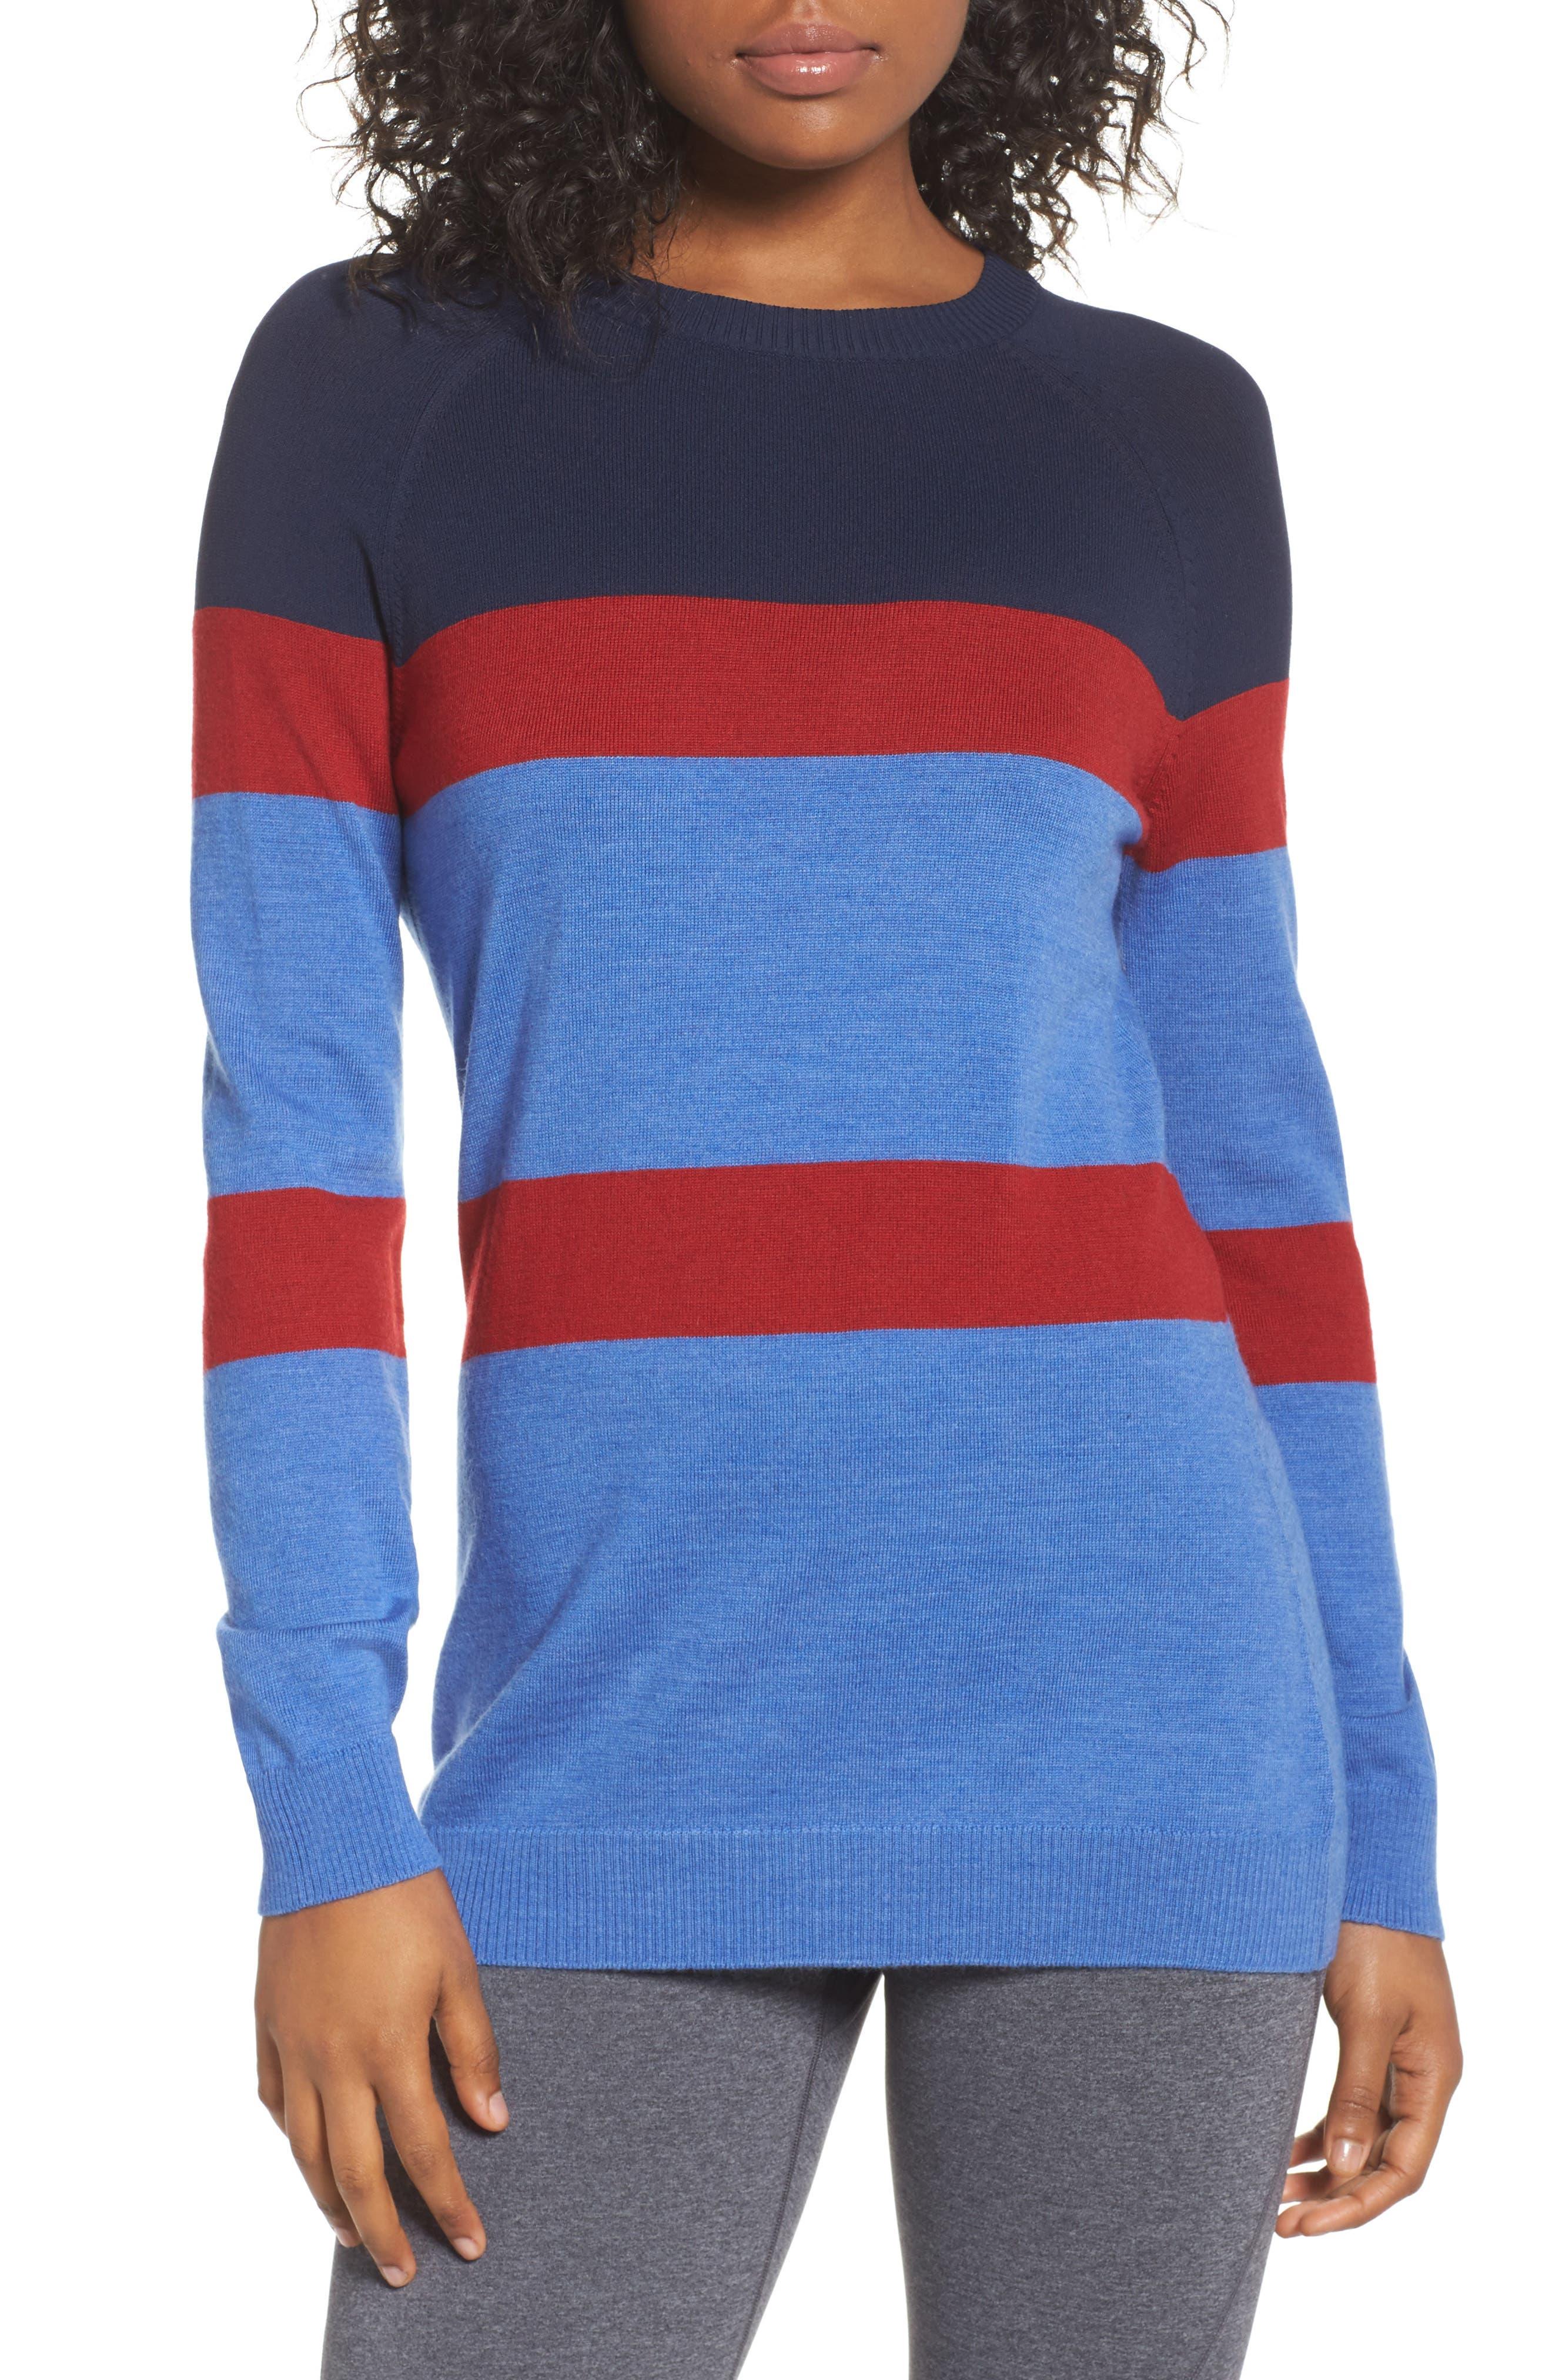 Main Image - LNDR Apres Sweater